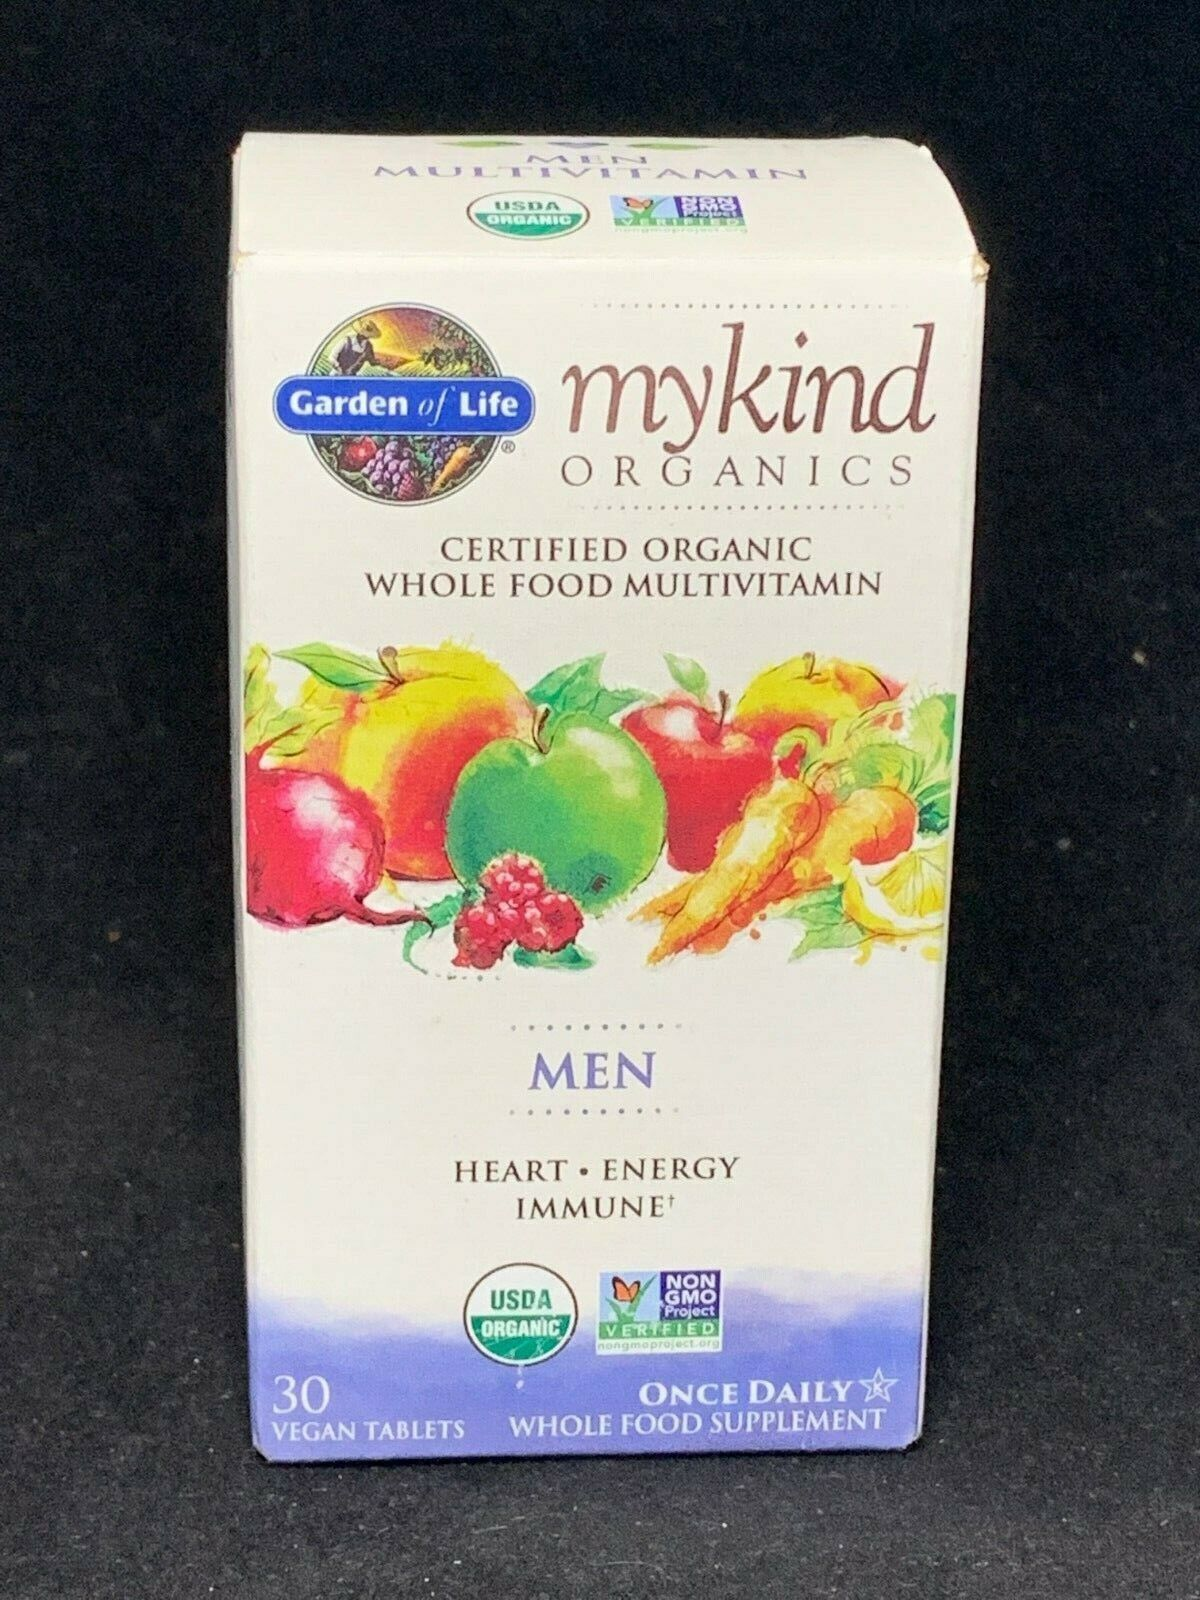 Garden of Life mykind Organics MEN Heart Energy Immune Multi